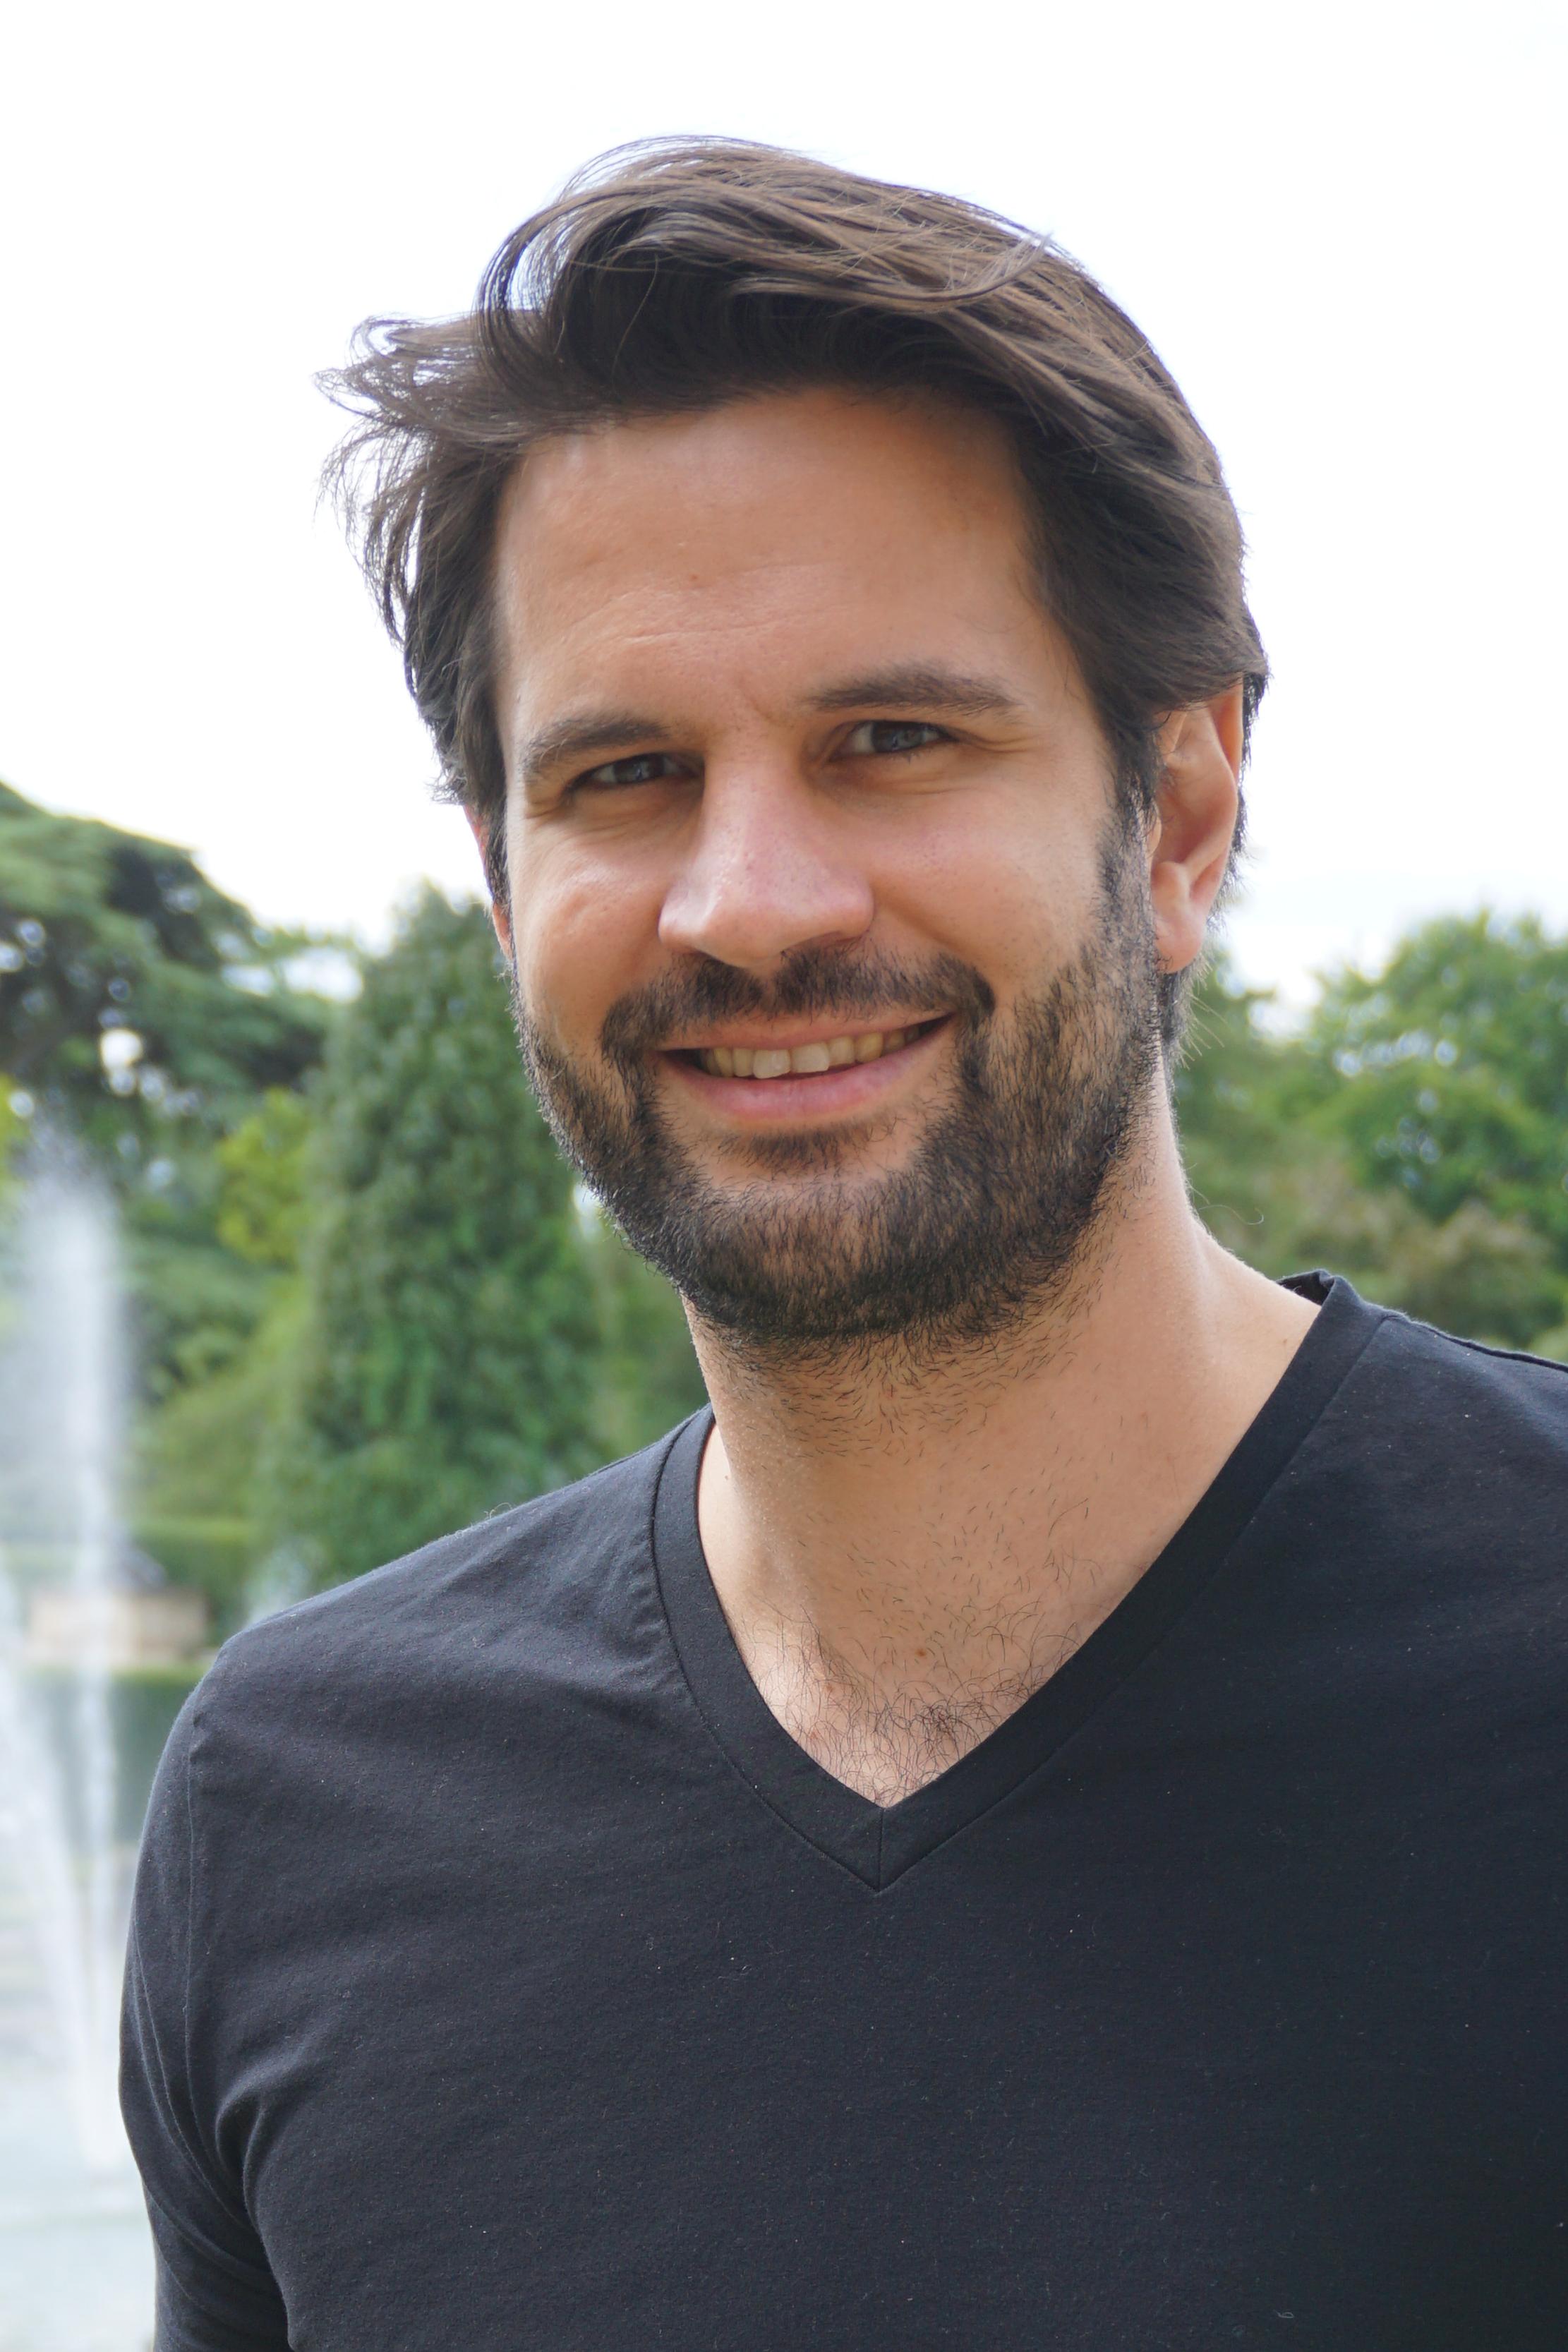 Josef Füssl Profilbild